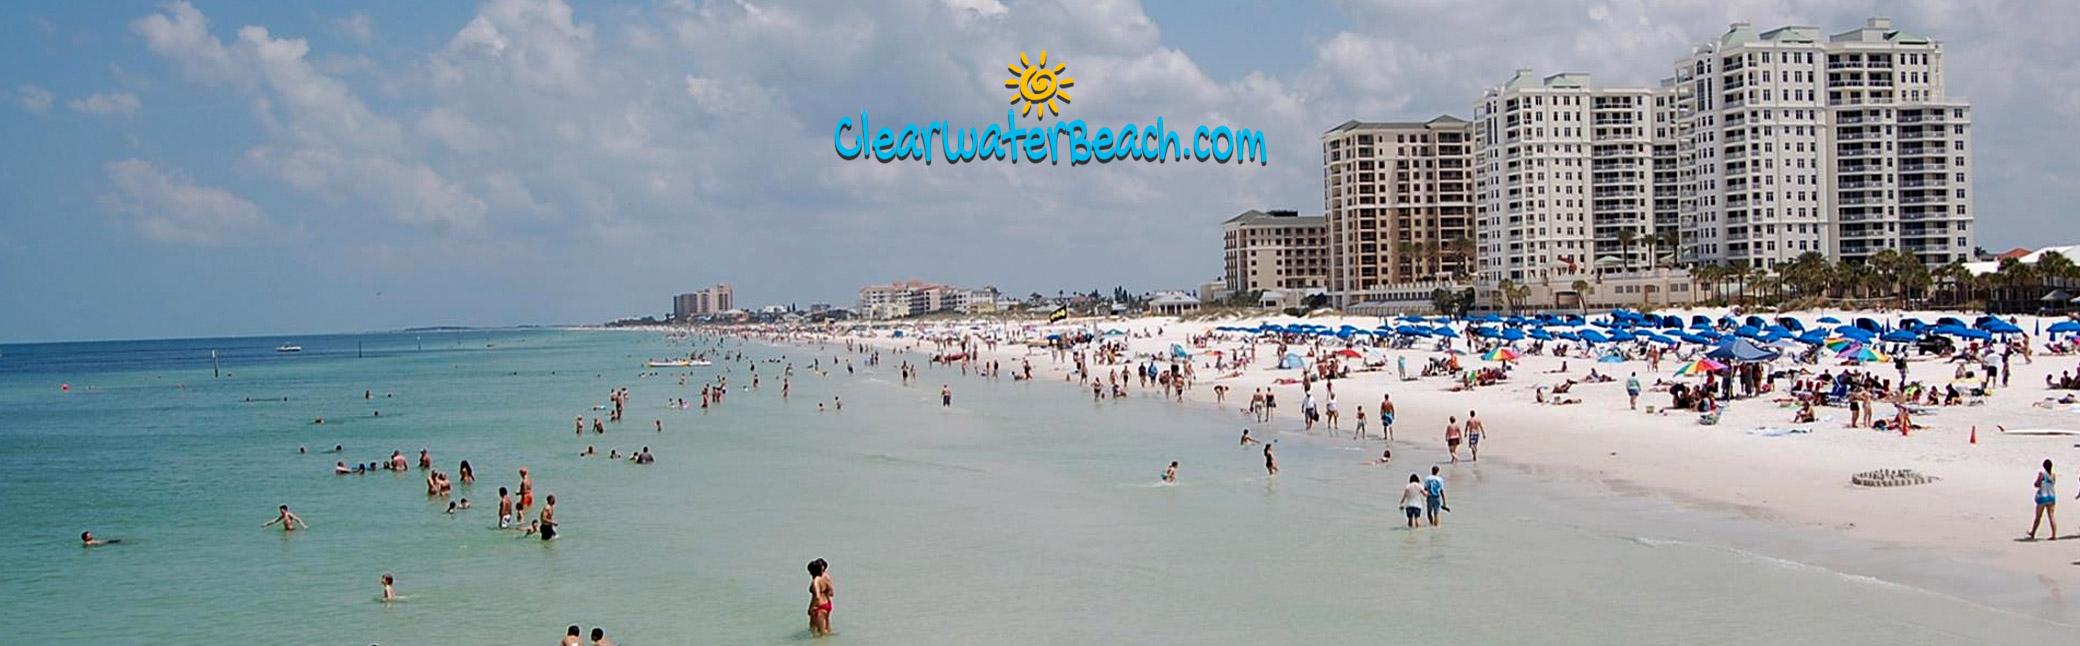 Clearwater Beach Weekly Rentals